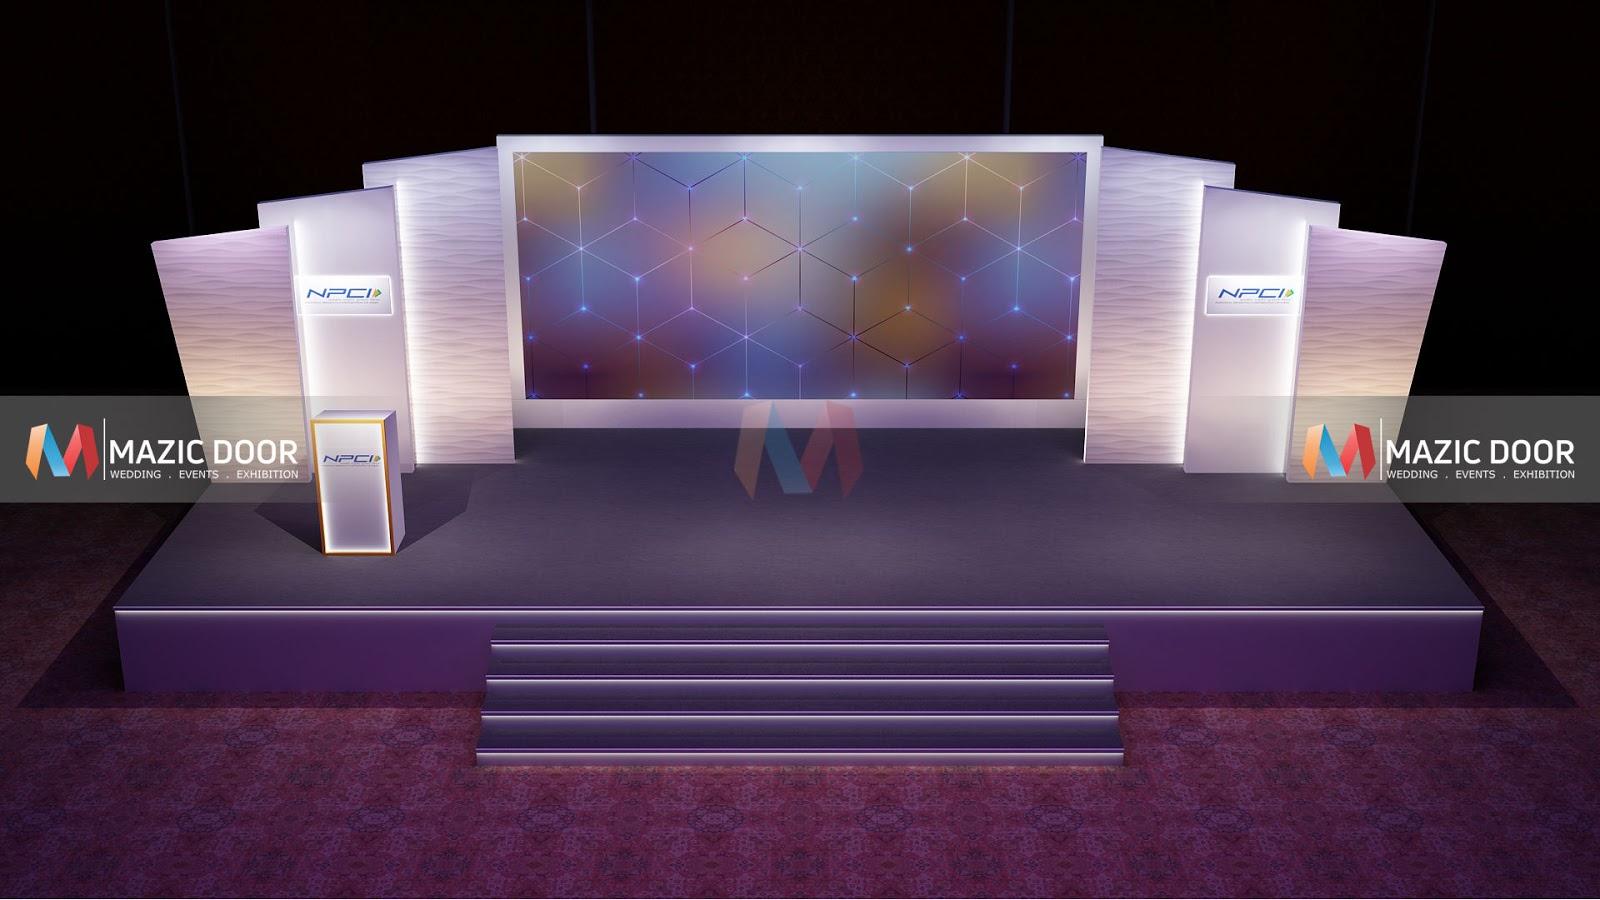 Exhibition Stall Design : Conference stage design mazic door